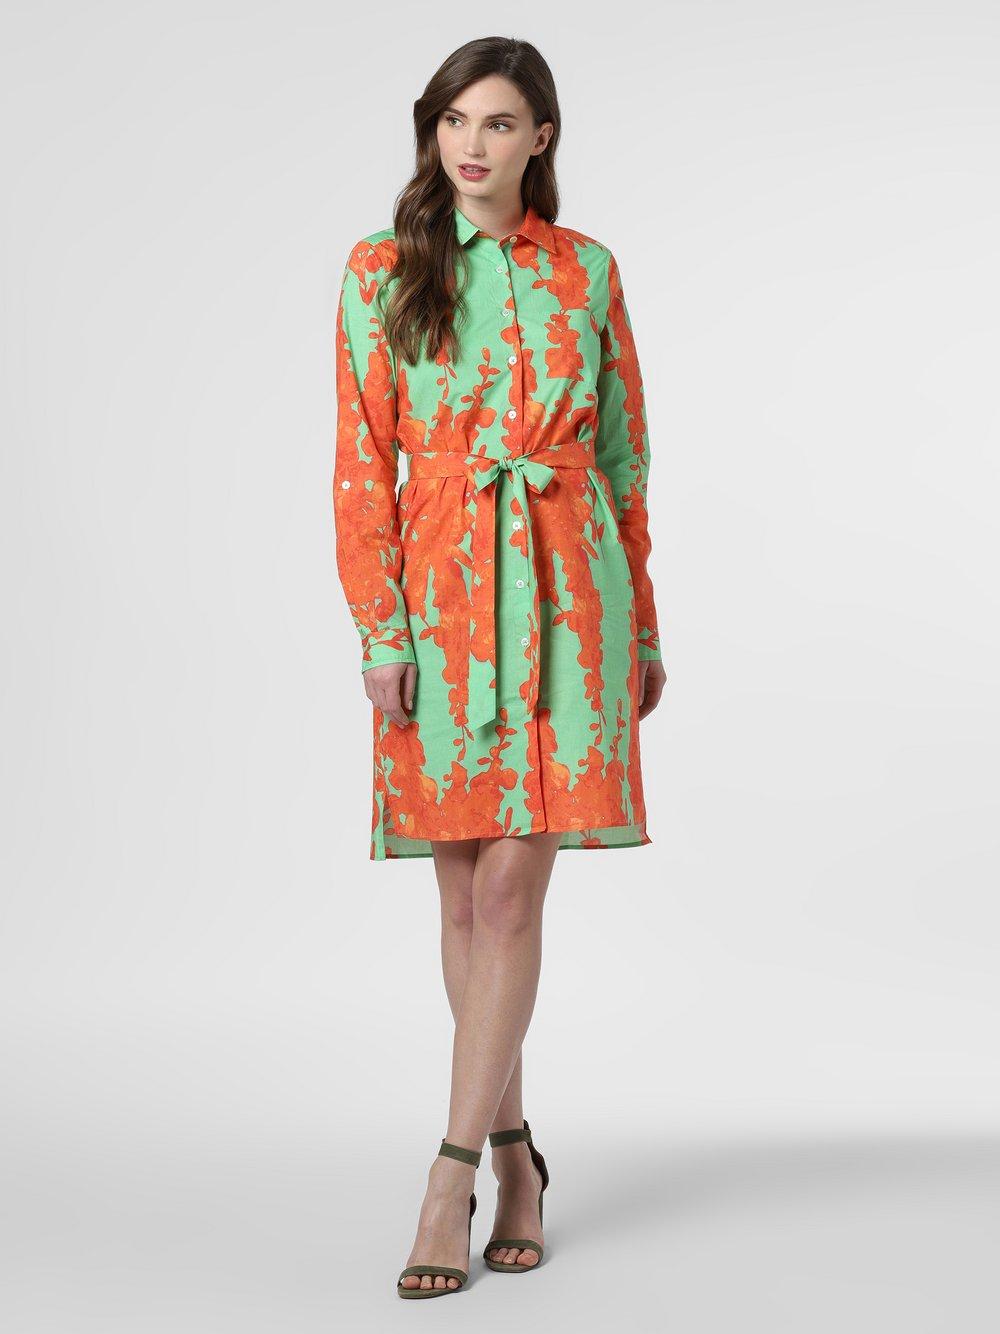 0039 Italy – Sukienka damska, pomarańczowy Van Graaf 464282-0001-09920